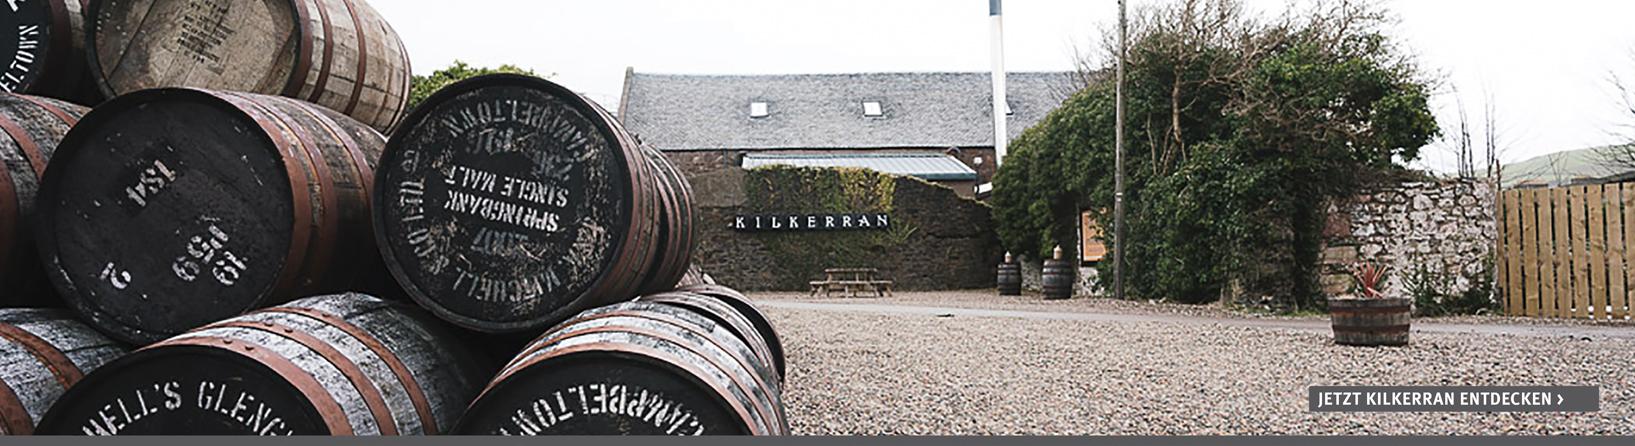 Glengyle Distillerie